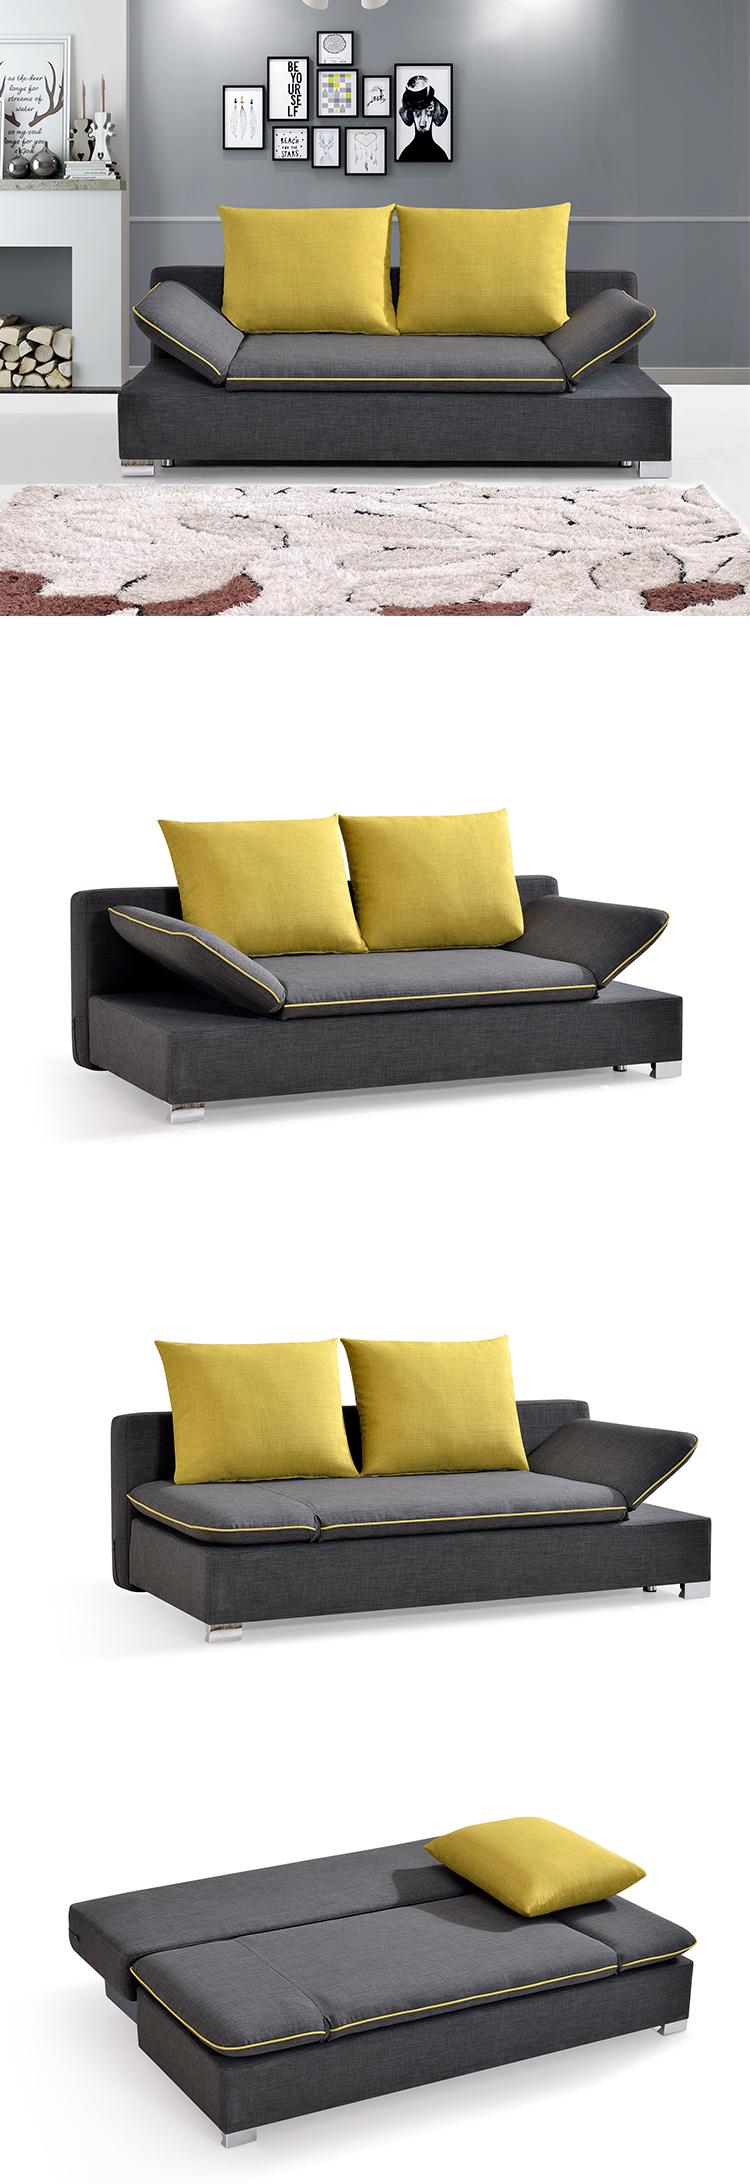 Modern Japanese Tatami Folding Smart Sofa Bed With Storage Living Room Sofas Aliexpress